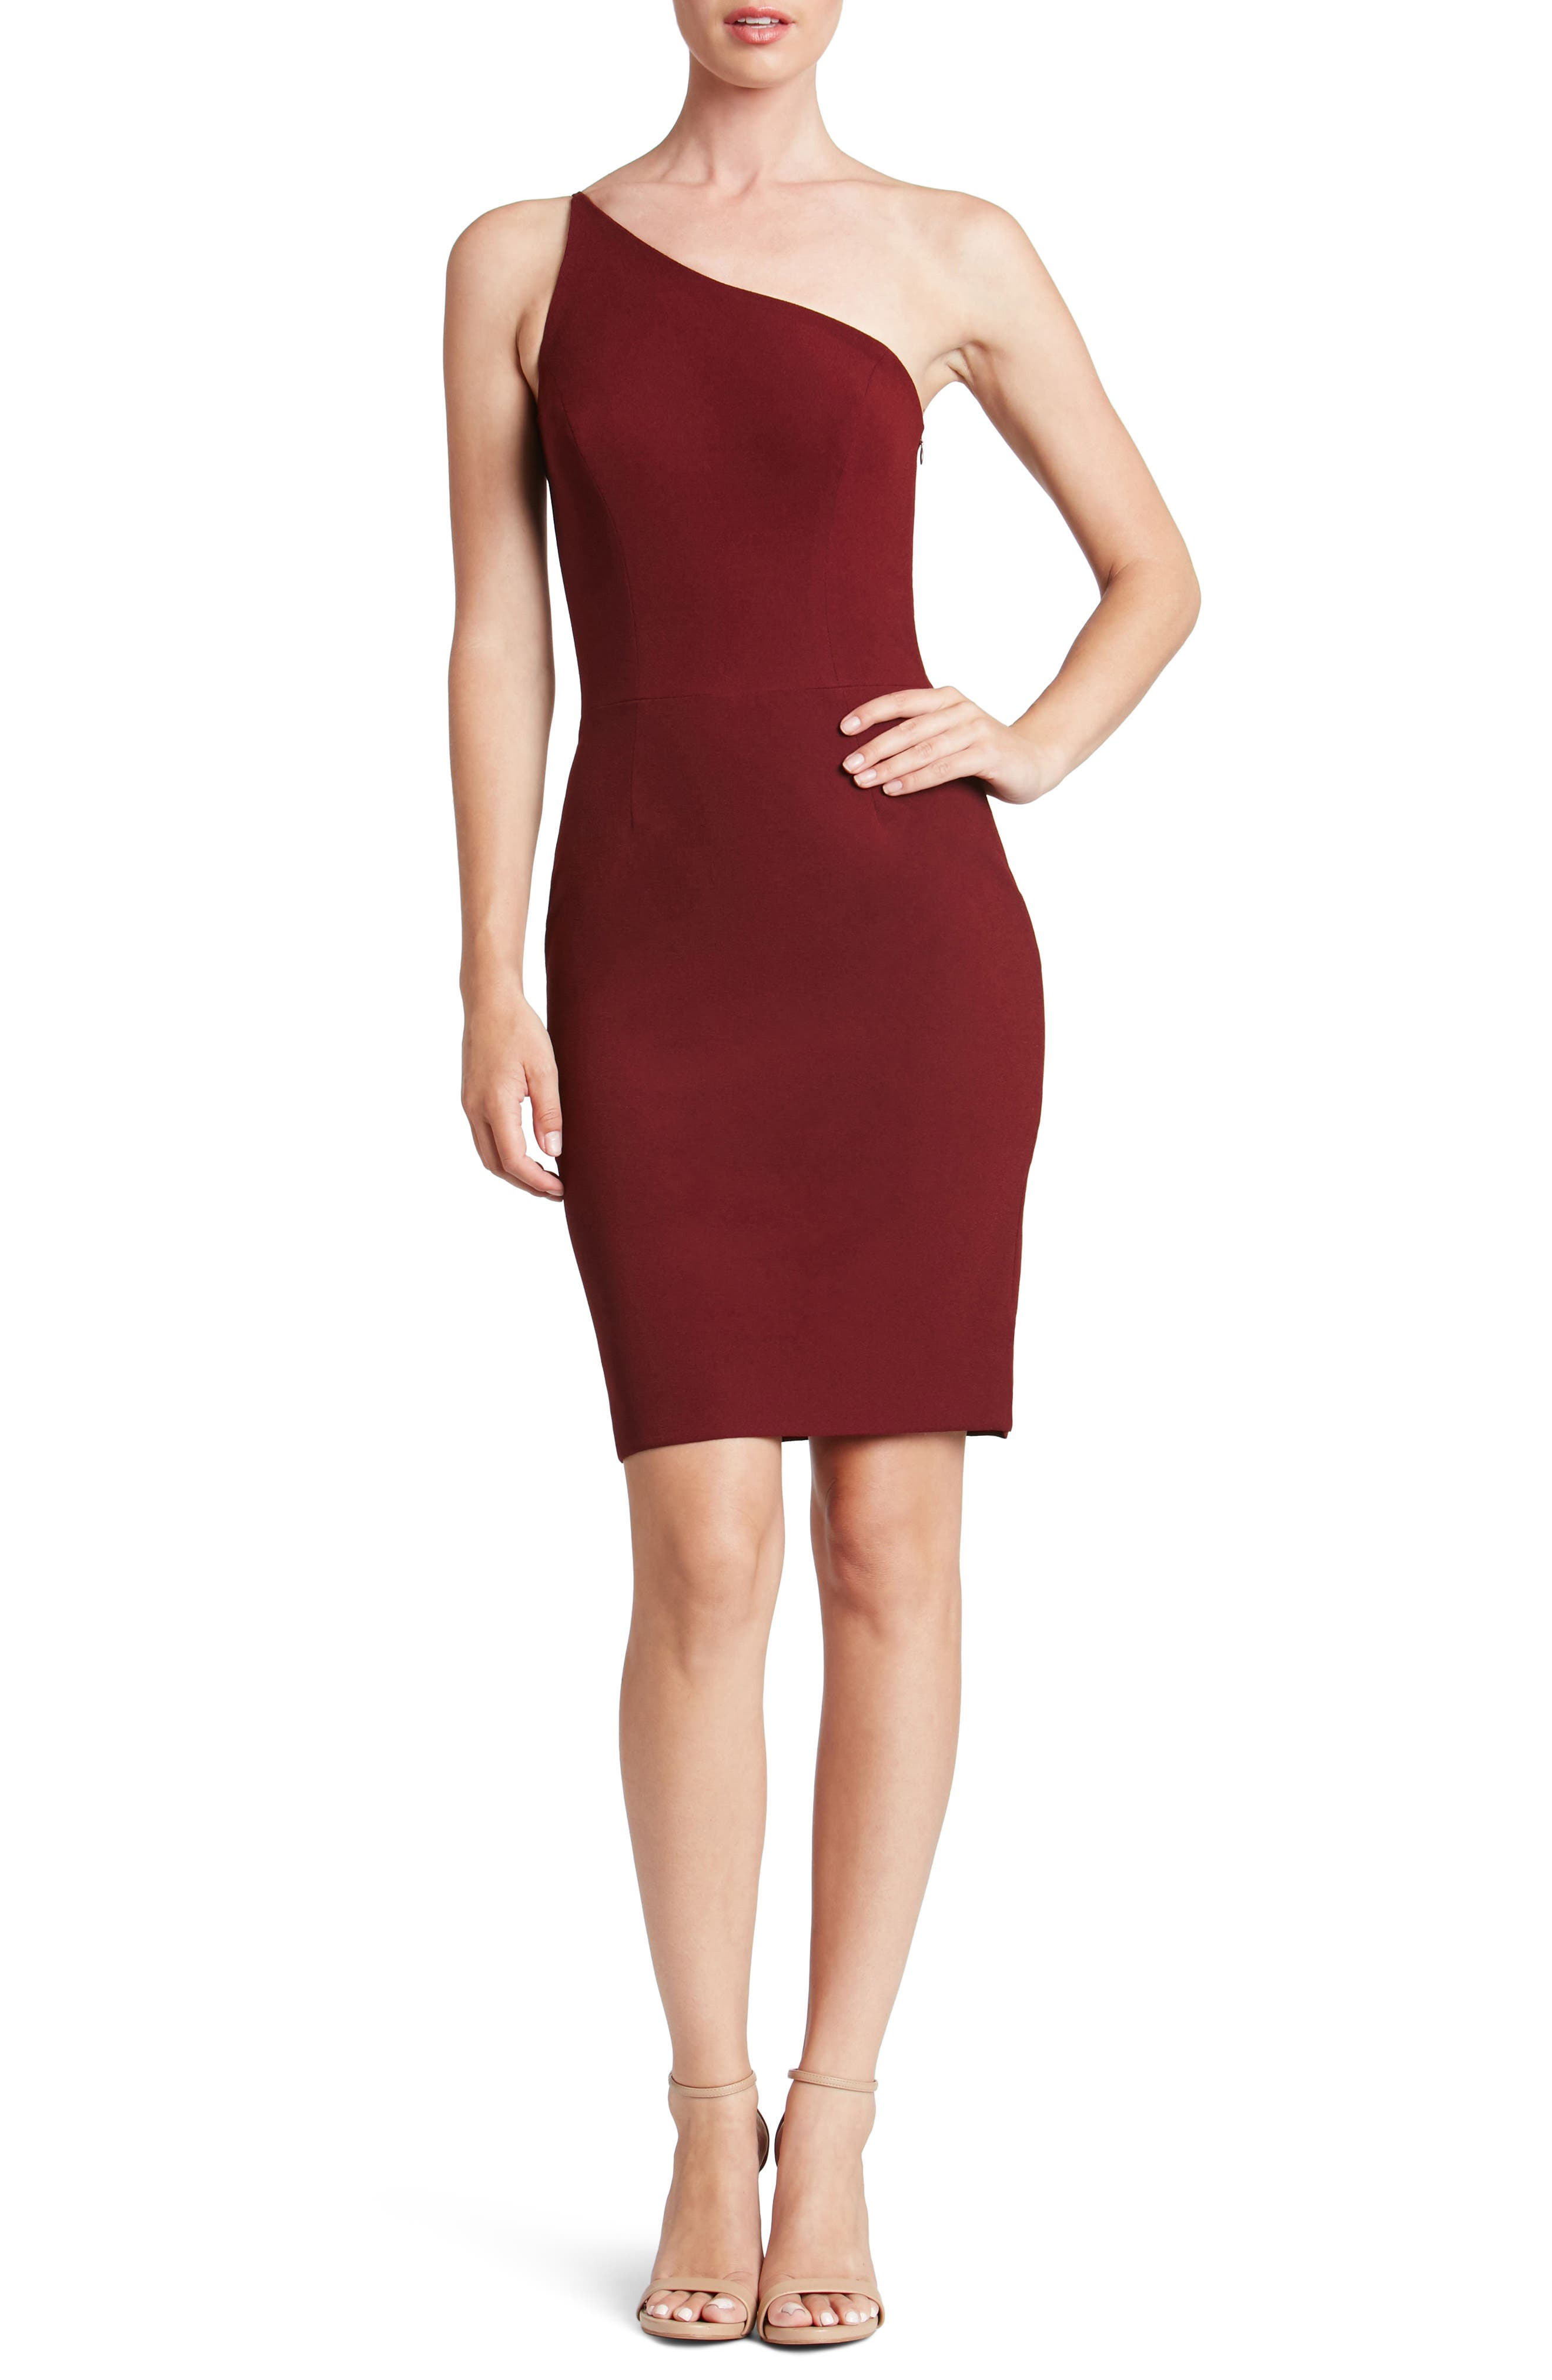 Jennifer One-Shoulder Body-Con Dress,                         Main,                         color, Burgundy